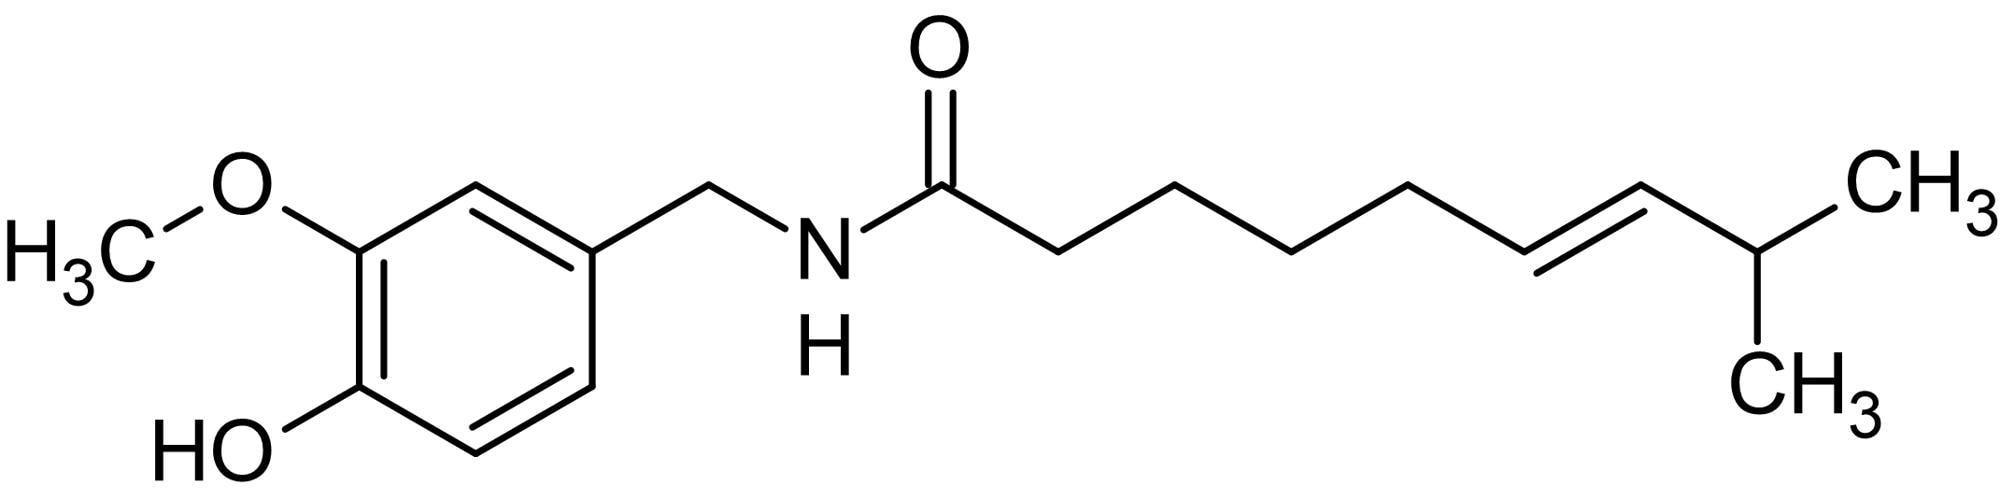 Chemical Structure - (E)-Capsaicin, Vanilloid receptor agonist (ab141000)